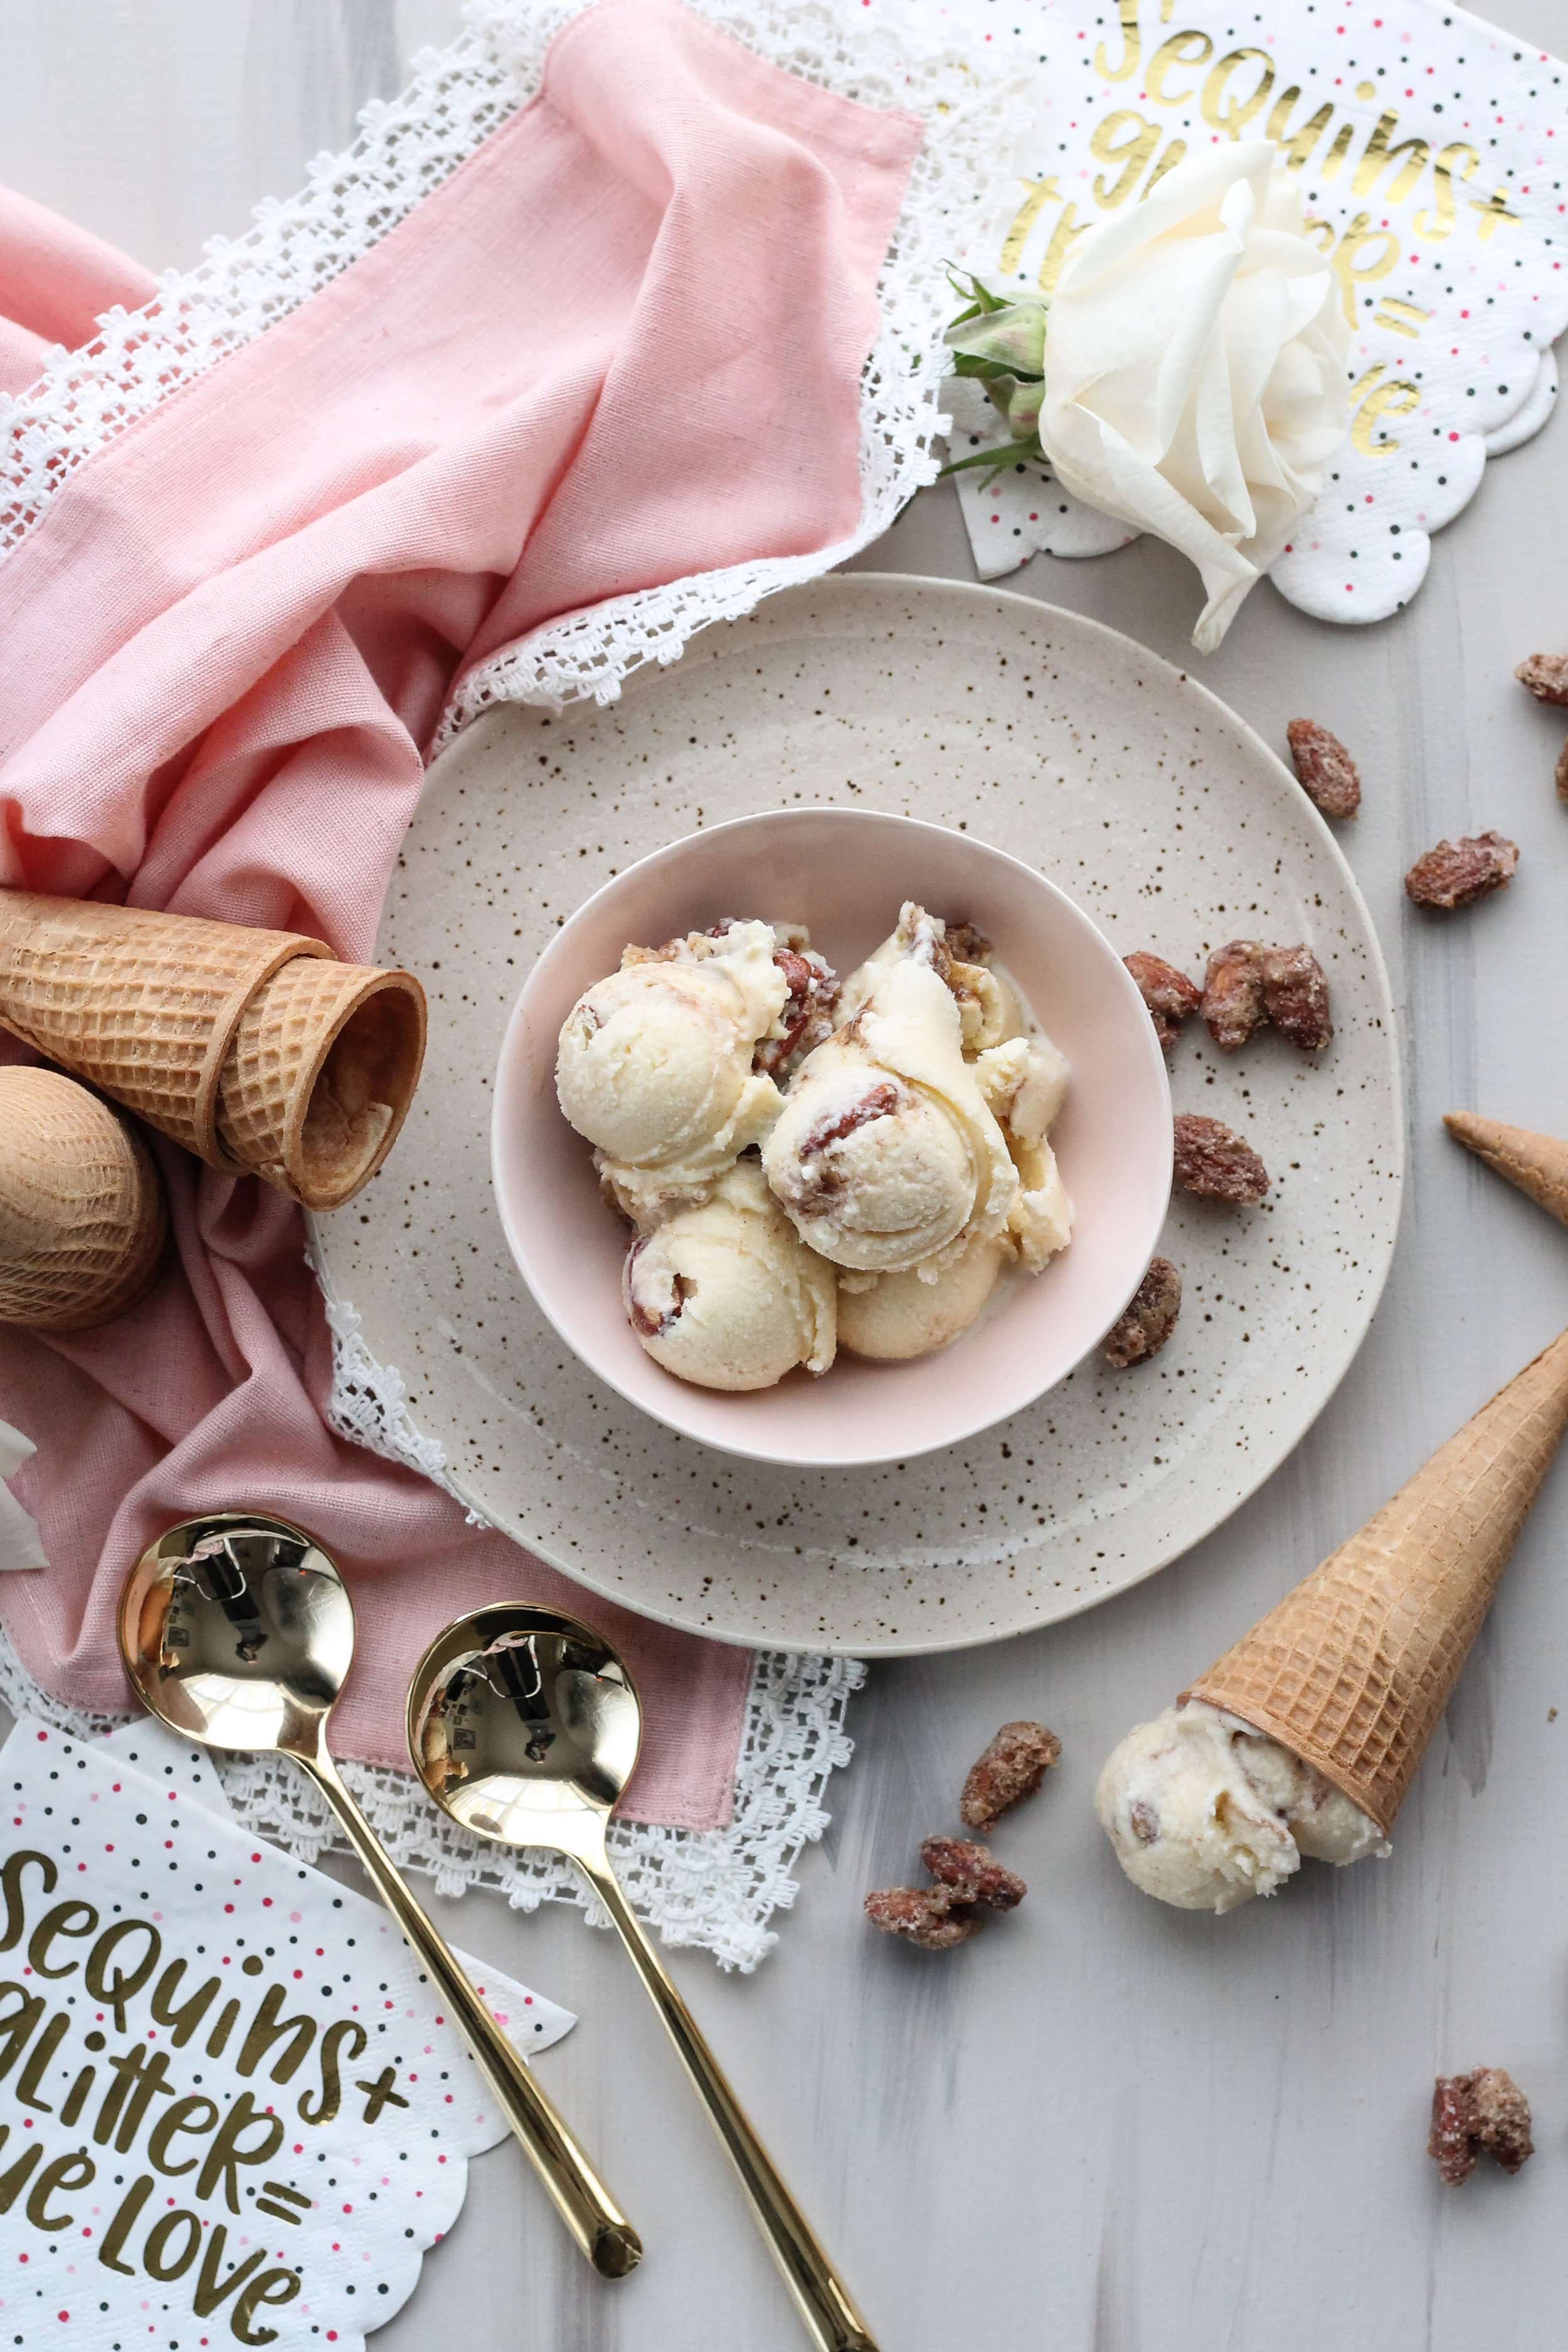 Quadruple Almond Crunch Ice Cream [ www.pedanticfoodie.com ]